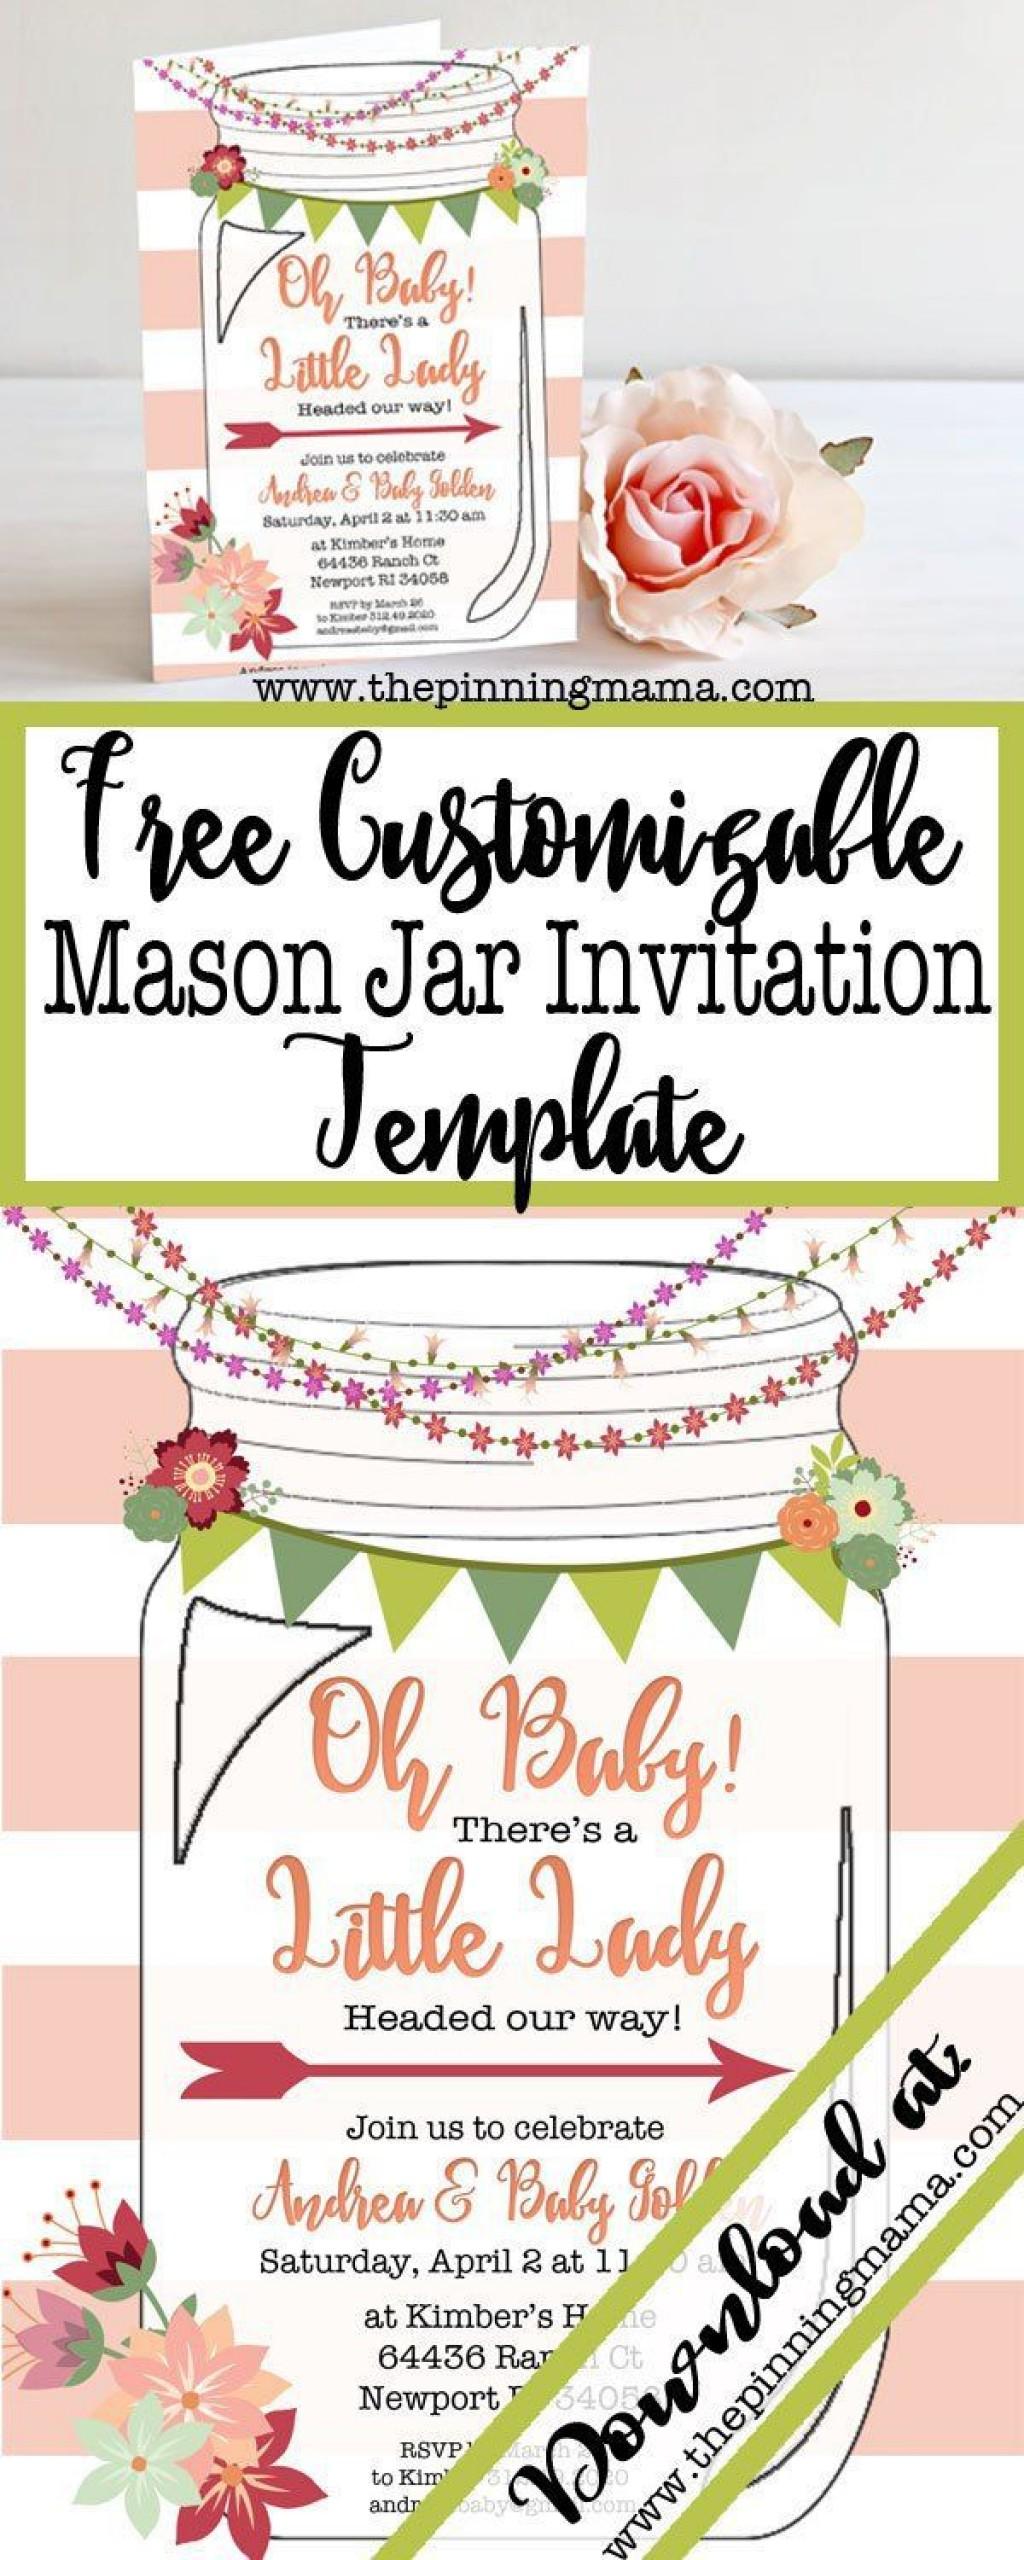 008 Astounding Mason Jar Invitation Template Example  Free Wedding Shower RusticLarge